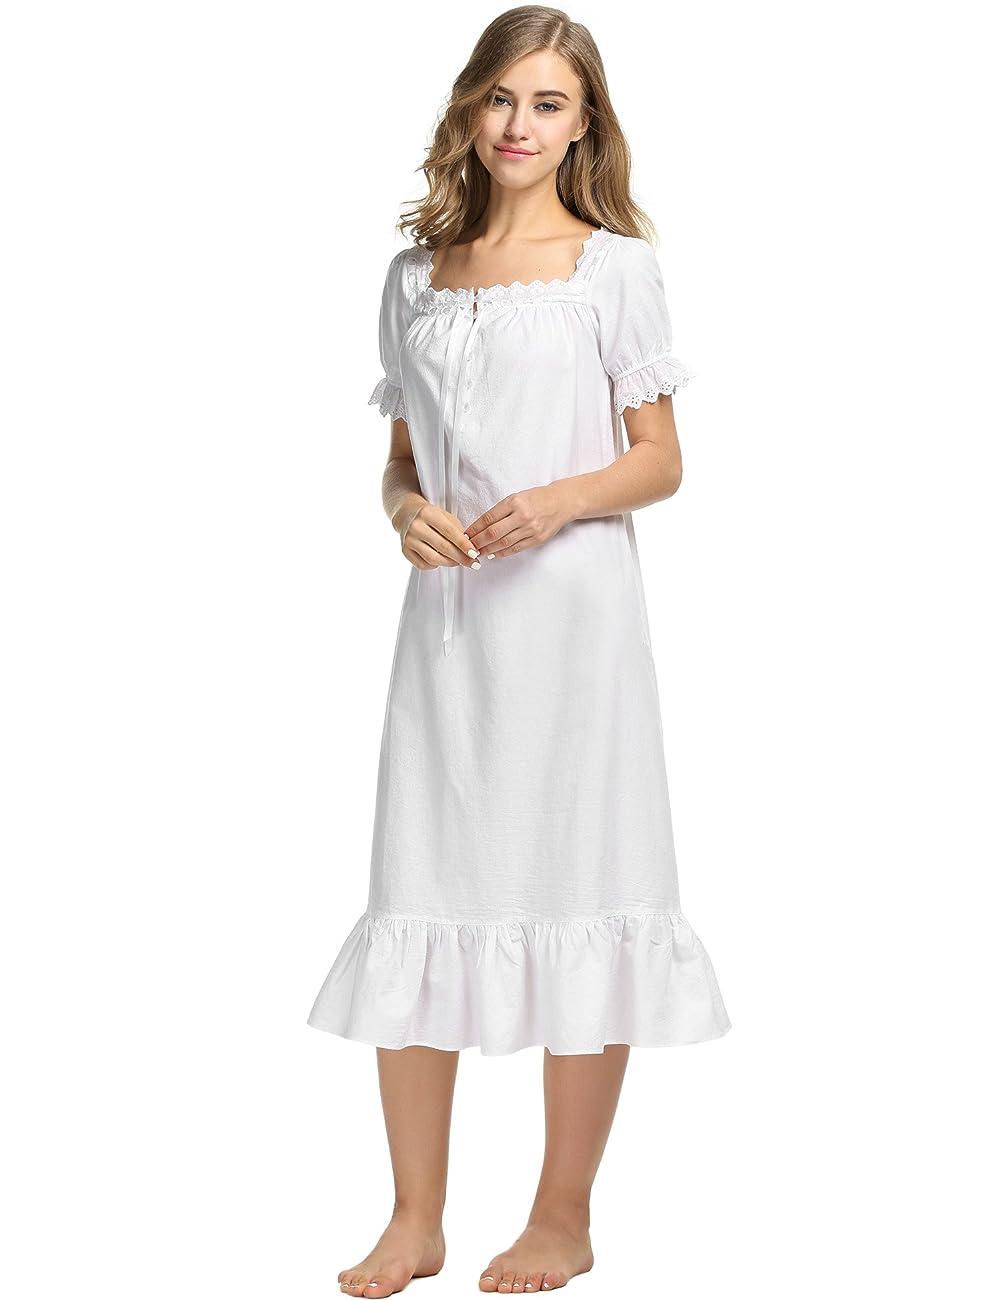 Avidlove Womens Cotton Victorian Vintage Short Sleeve Nightgown Sleepwear 3